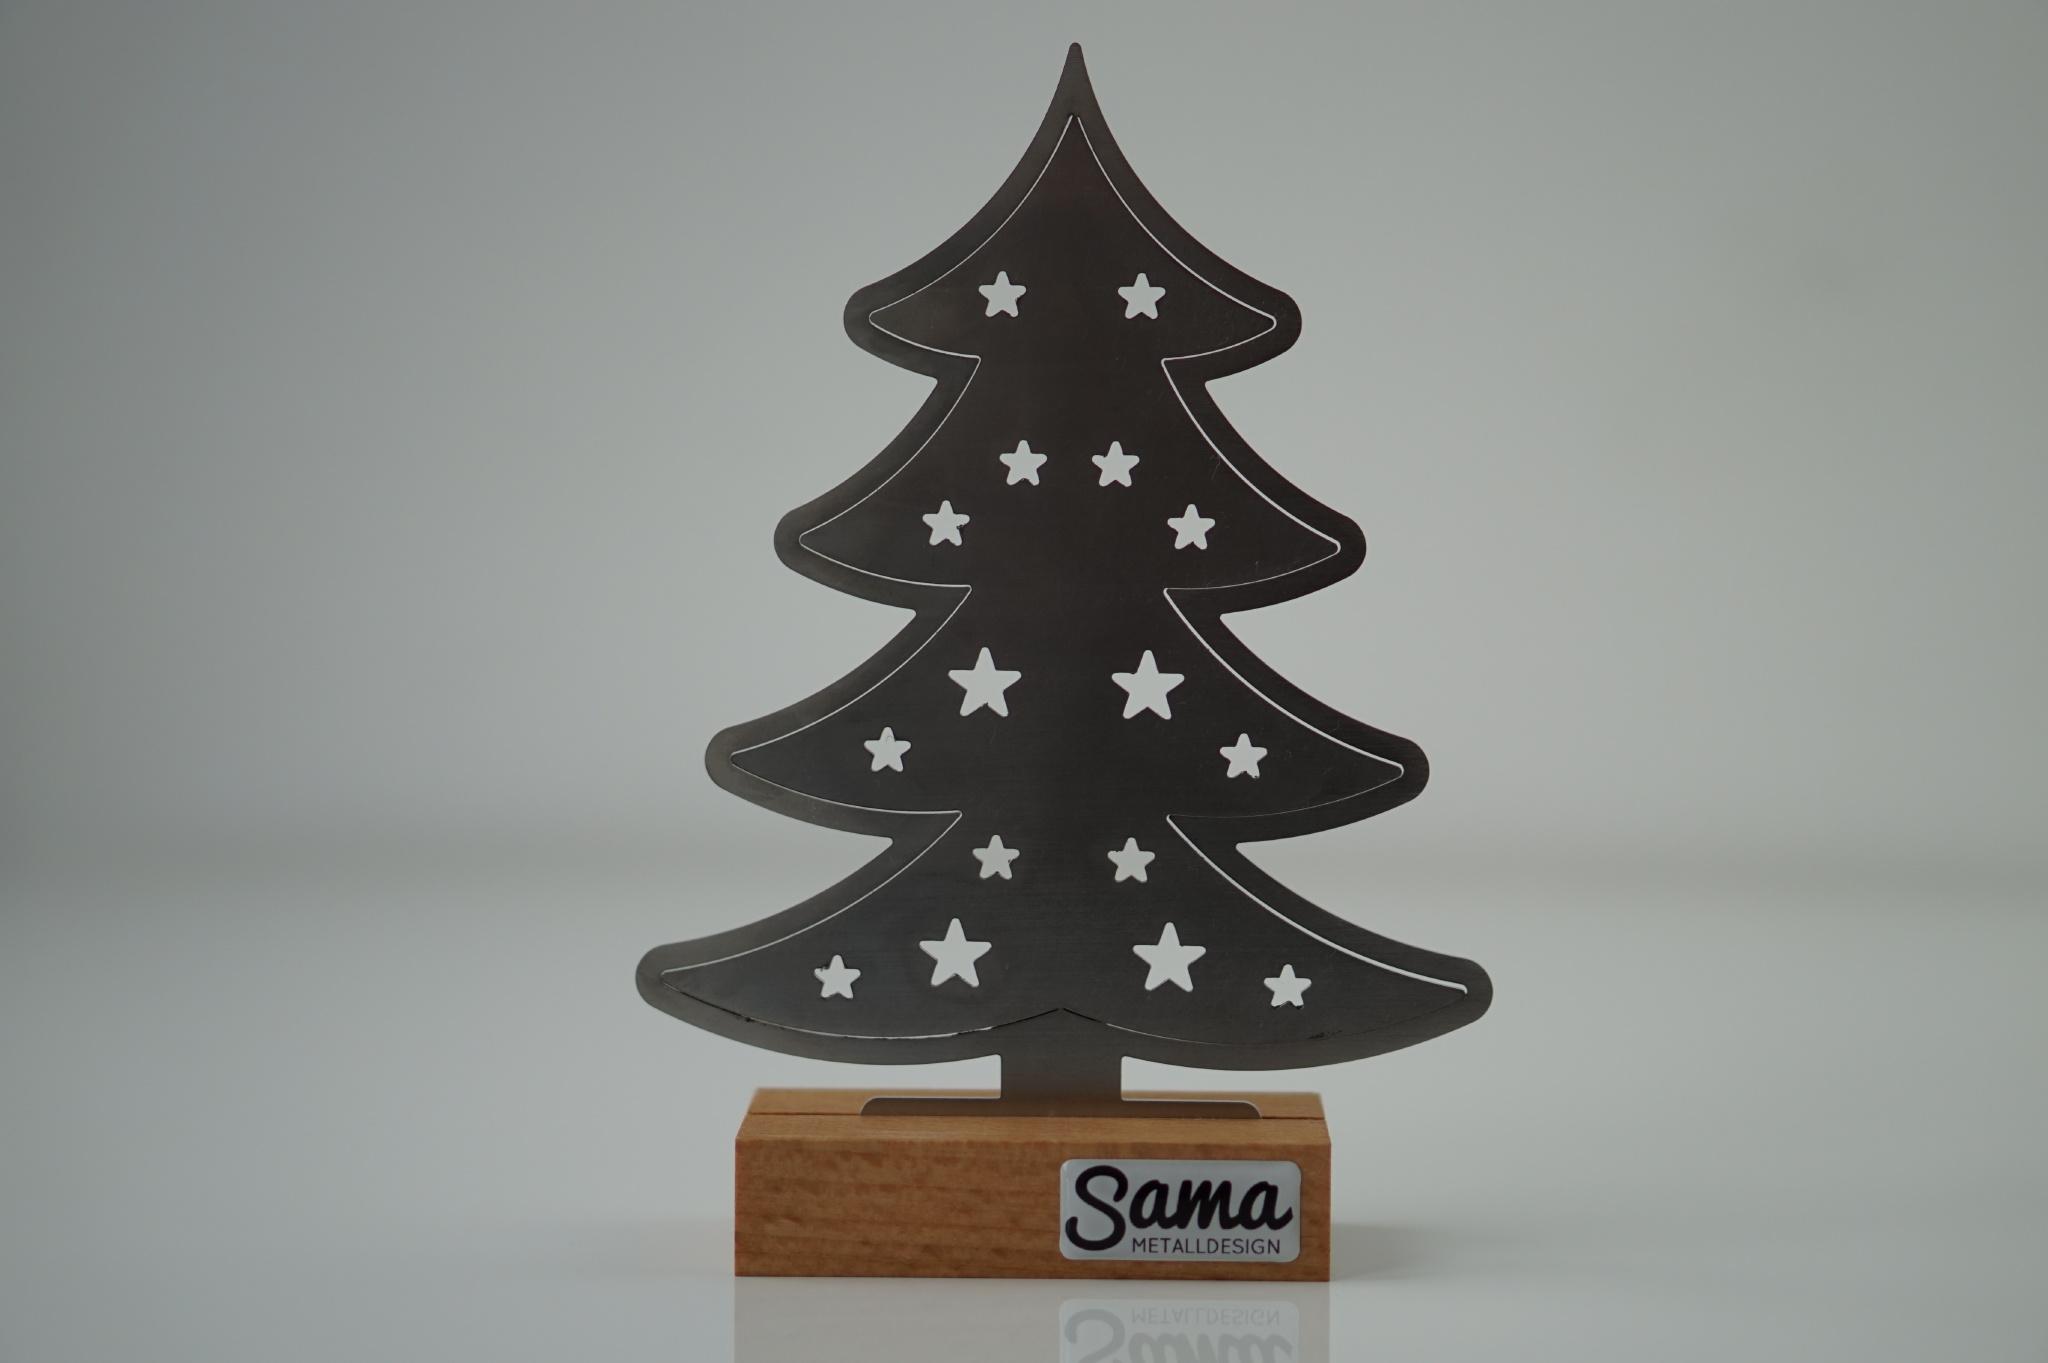 weihnachtsbaum ludwig aus edelstahl sama metalldesign. Black Bedroom Furniture Sets. Home Design Ideas